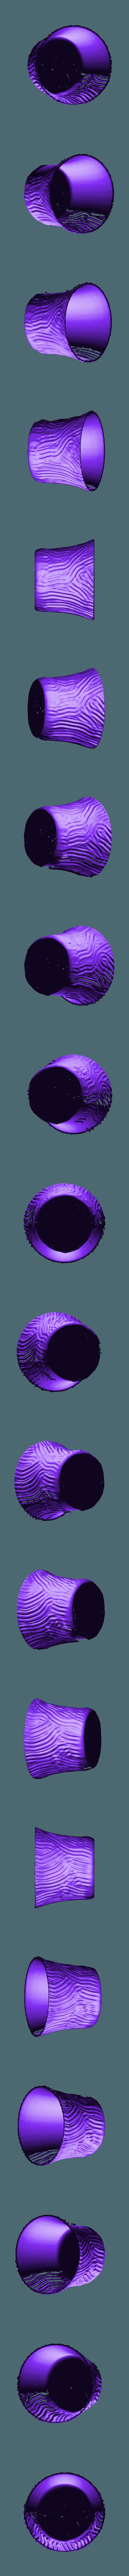 Easter Bunny's Pot 3DWithUs.stl Download free STL file Easter Bunny Toy/Pot/Planter • 3D printable model, MaxFunkner